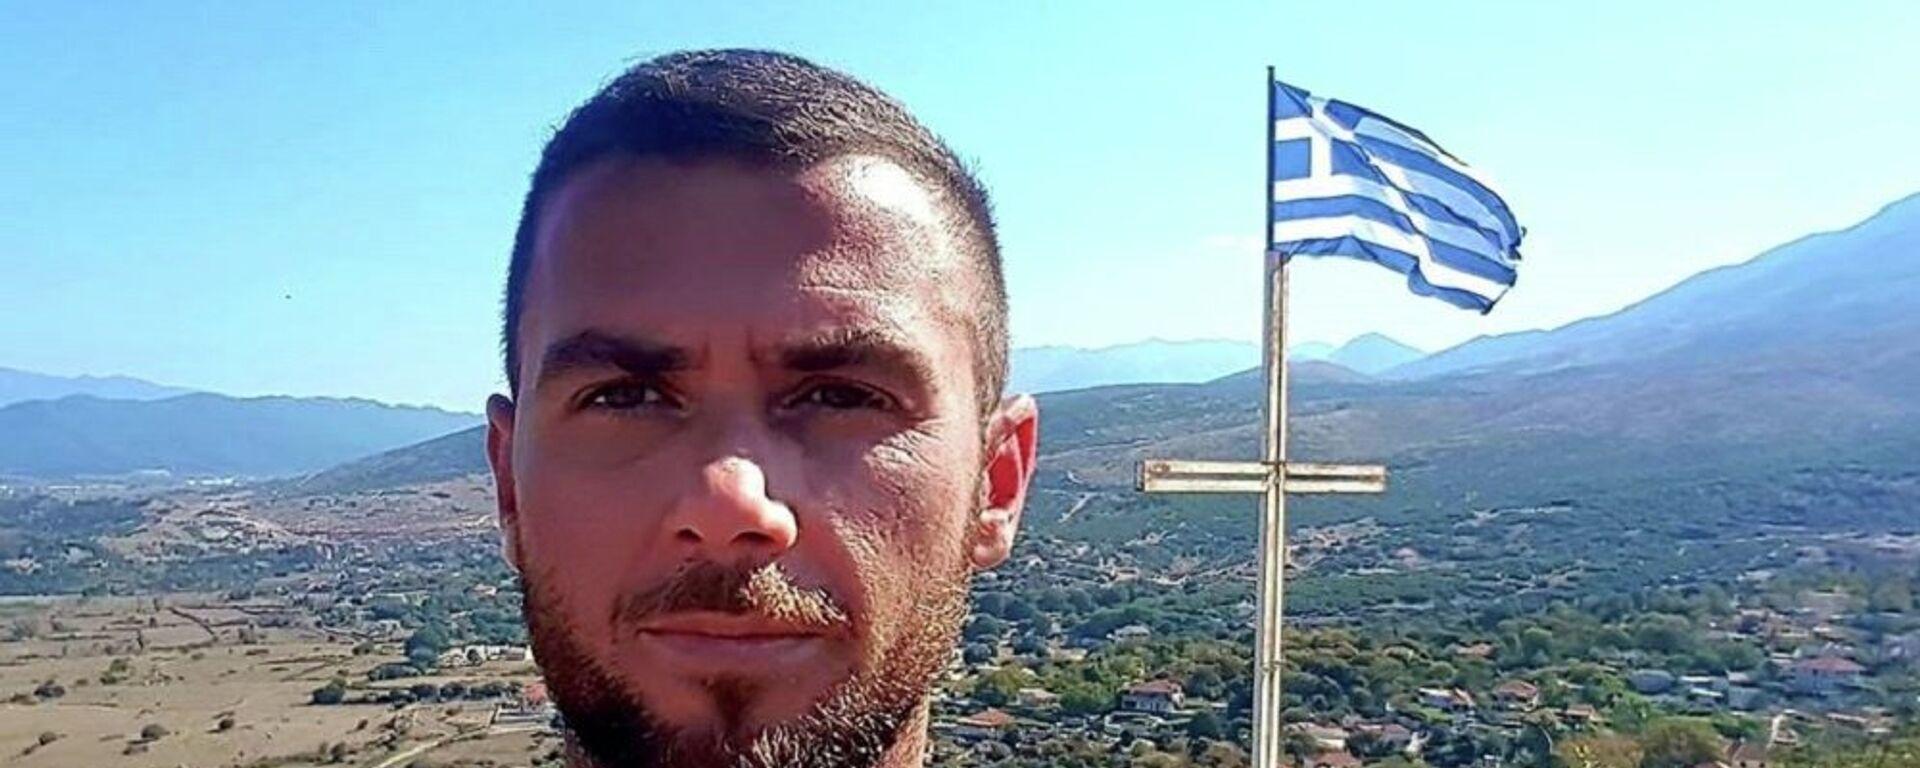 O 35χρονος ομογενής Κώστας Κατσίφας - Sputnik Ελλάδα, 1920, 11.10.2021